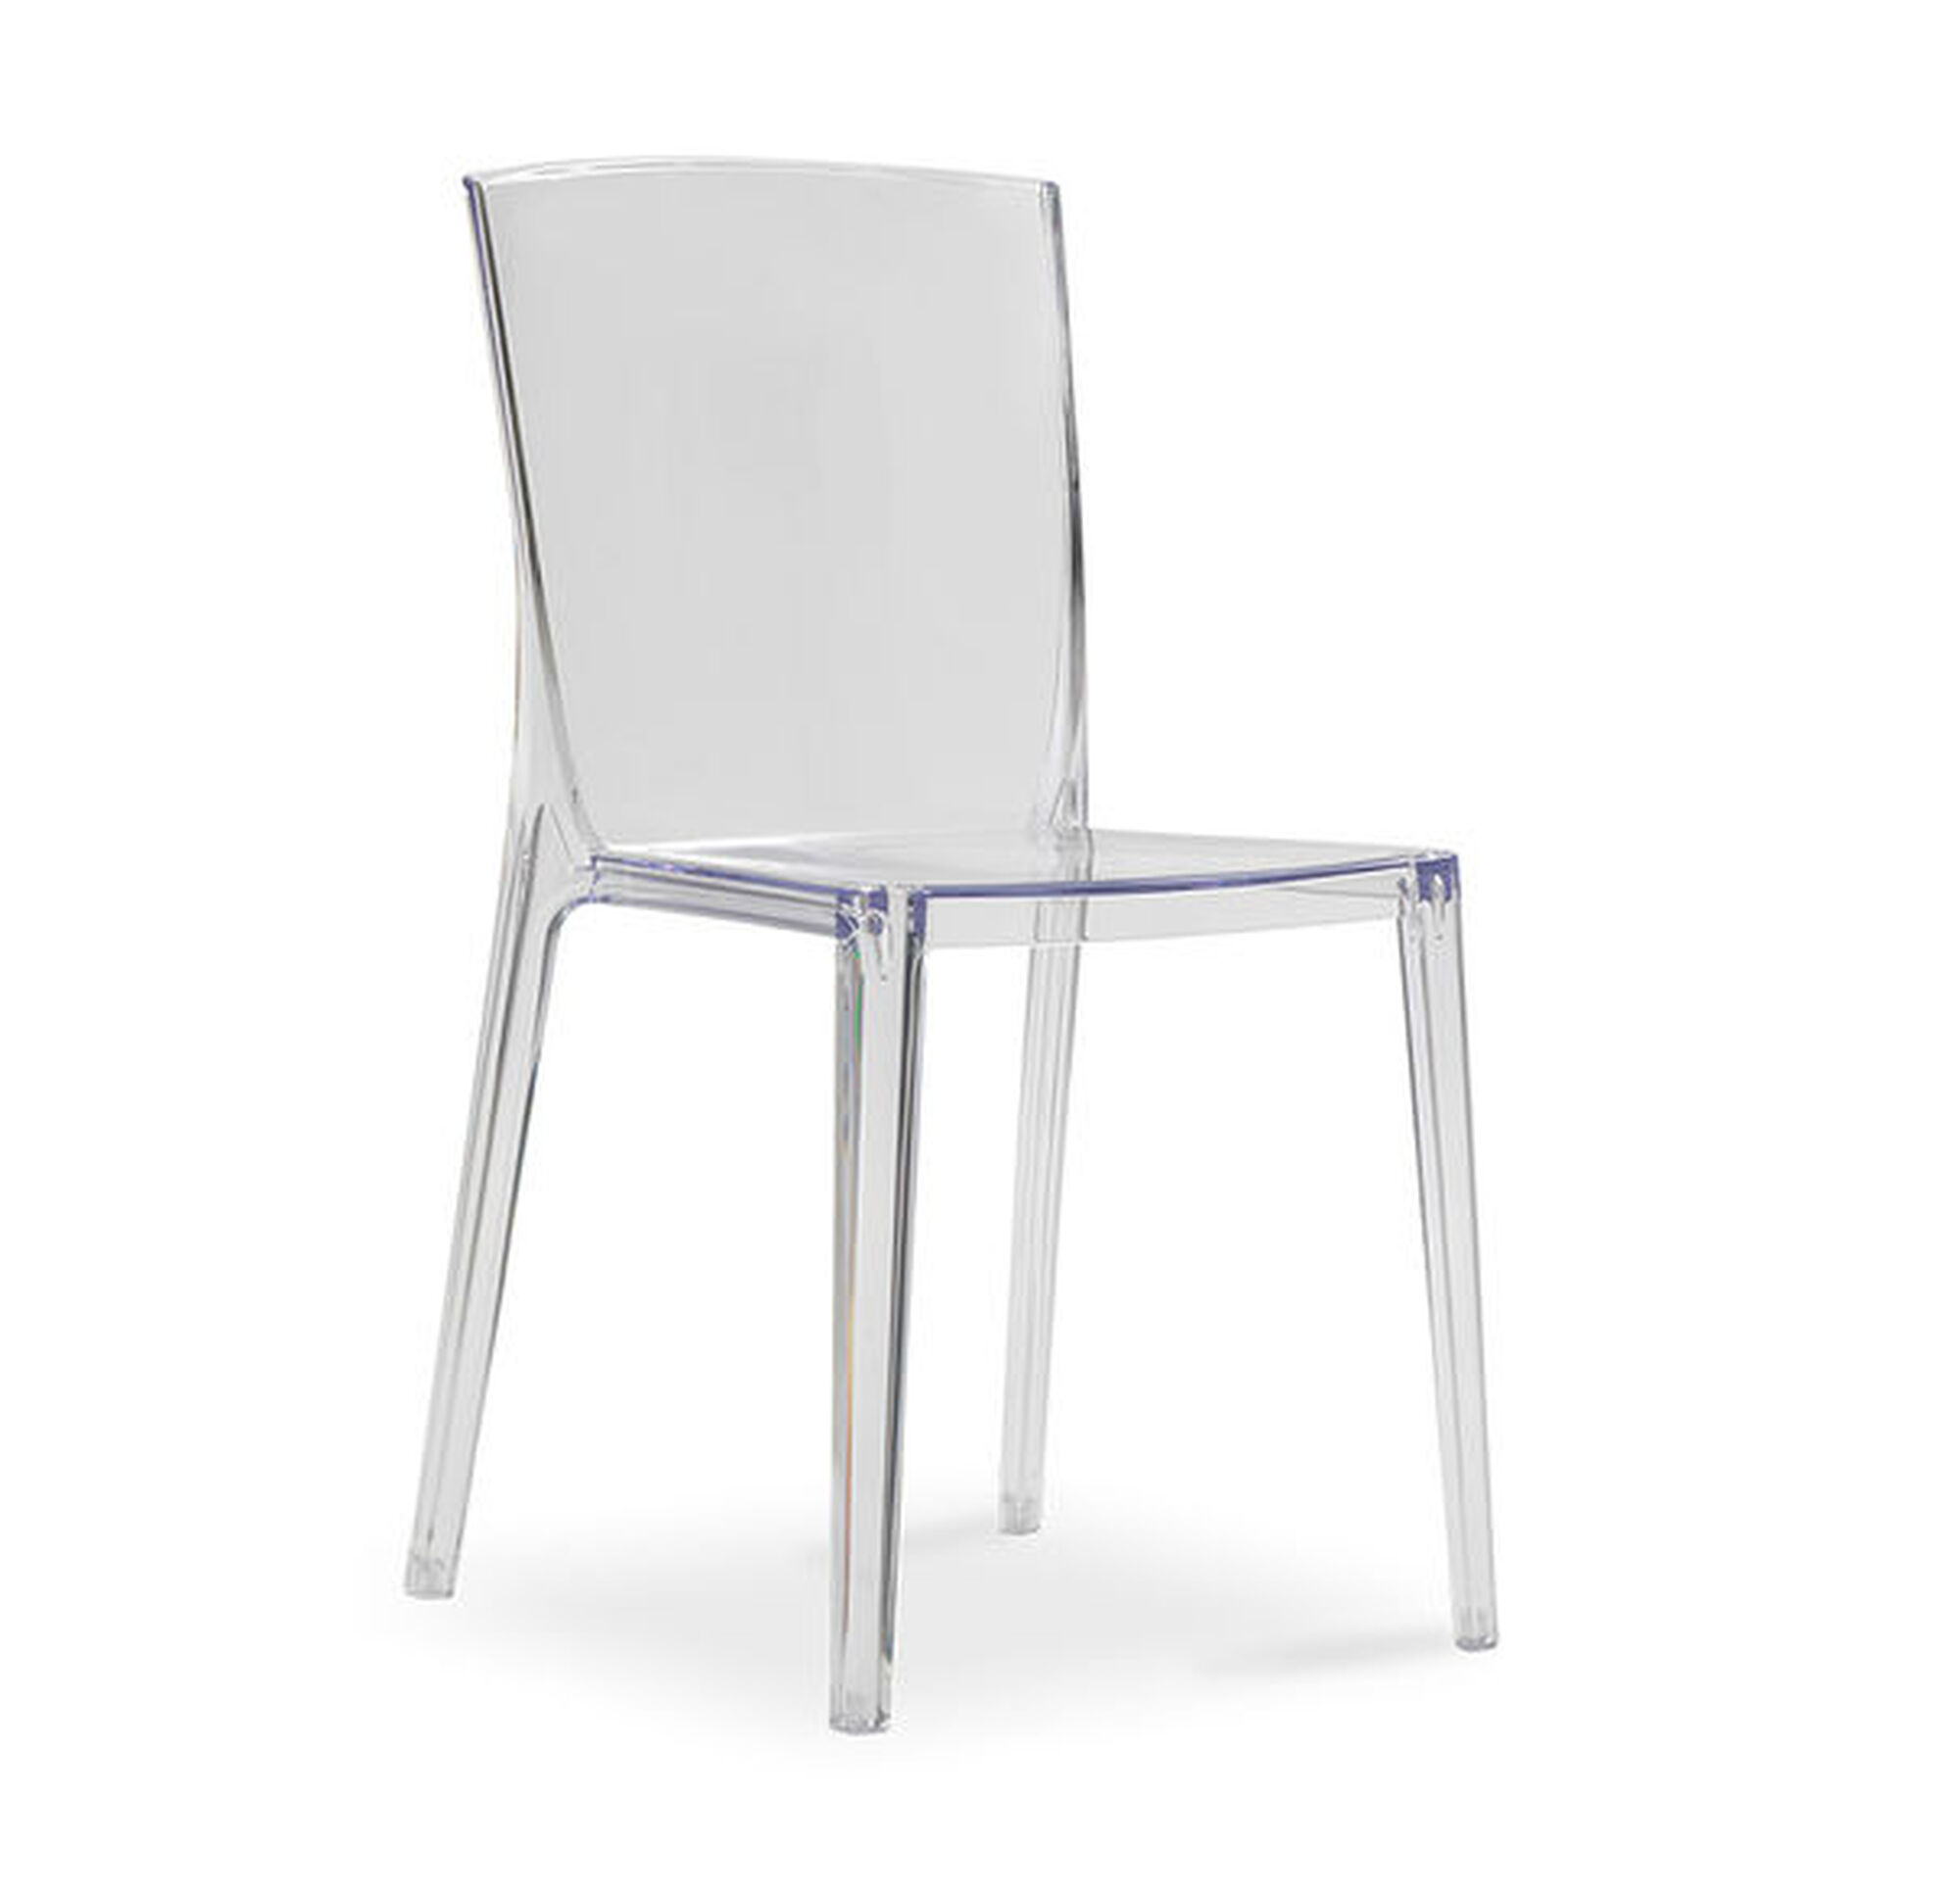 Inspirational Clear Dining Chair Luxury Inmunoanalisiscom : Alain1748 030 CLRHERO from www.inmunoanalisis.com size 2000 x 1934 jpeg 93kB